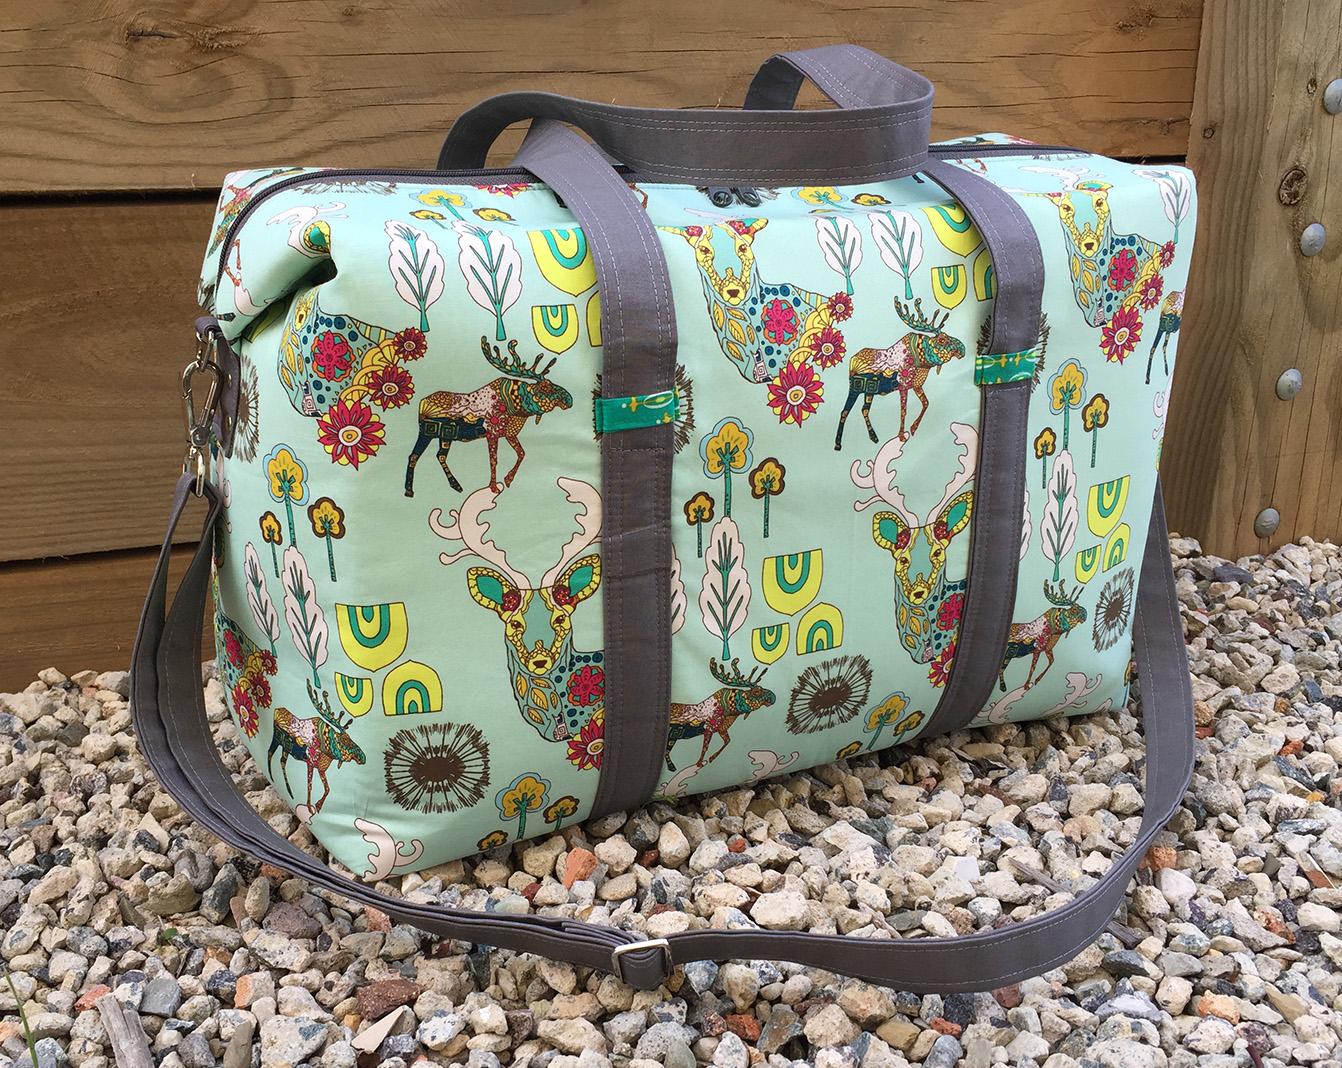 Sew Sweetness Emblem Duffle Bag sewing pattern, sewn by Melisa Jane Handmade